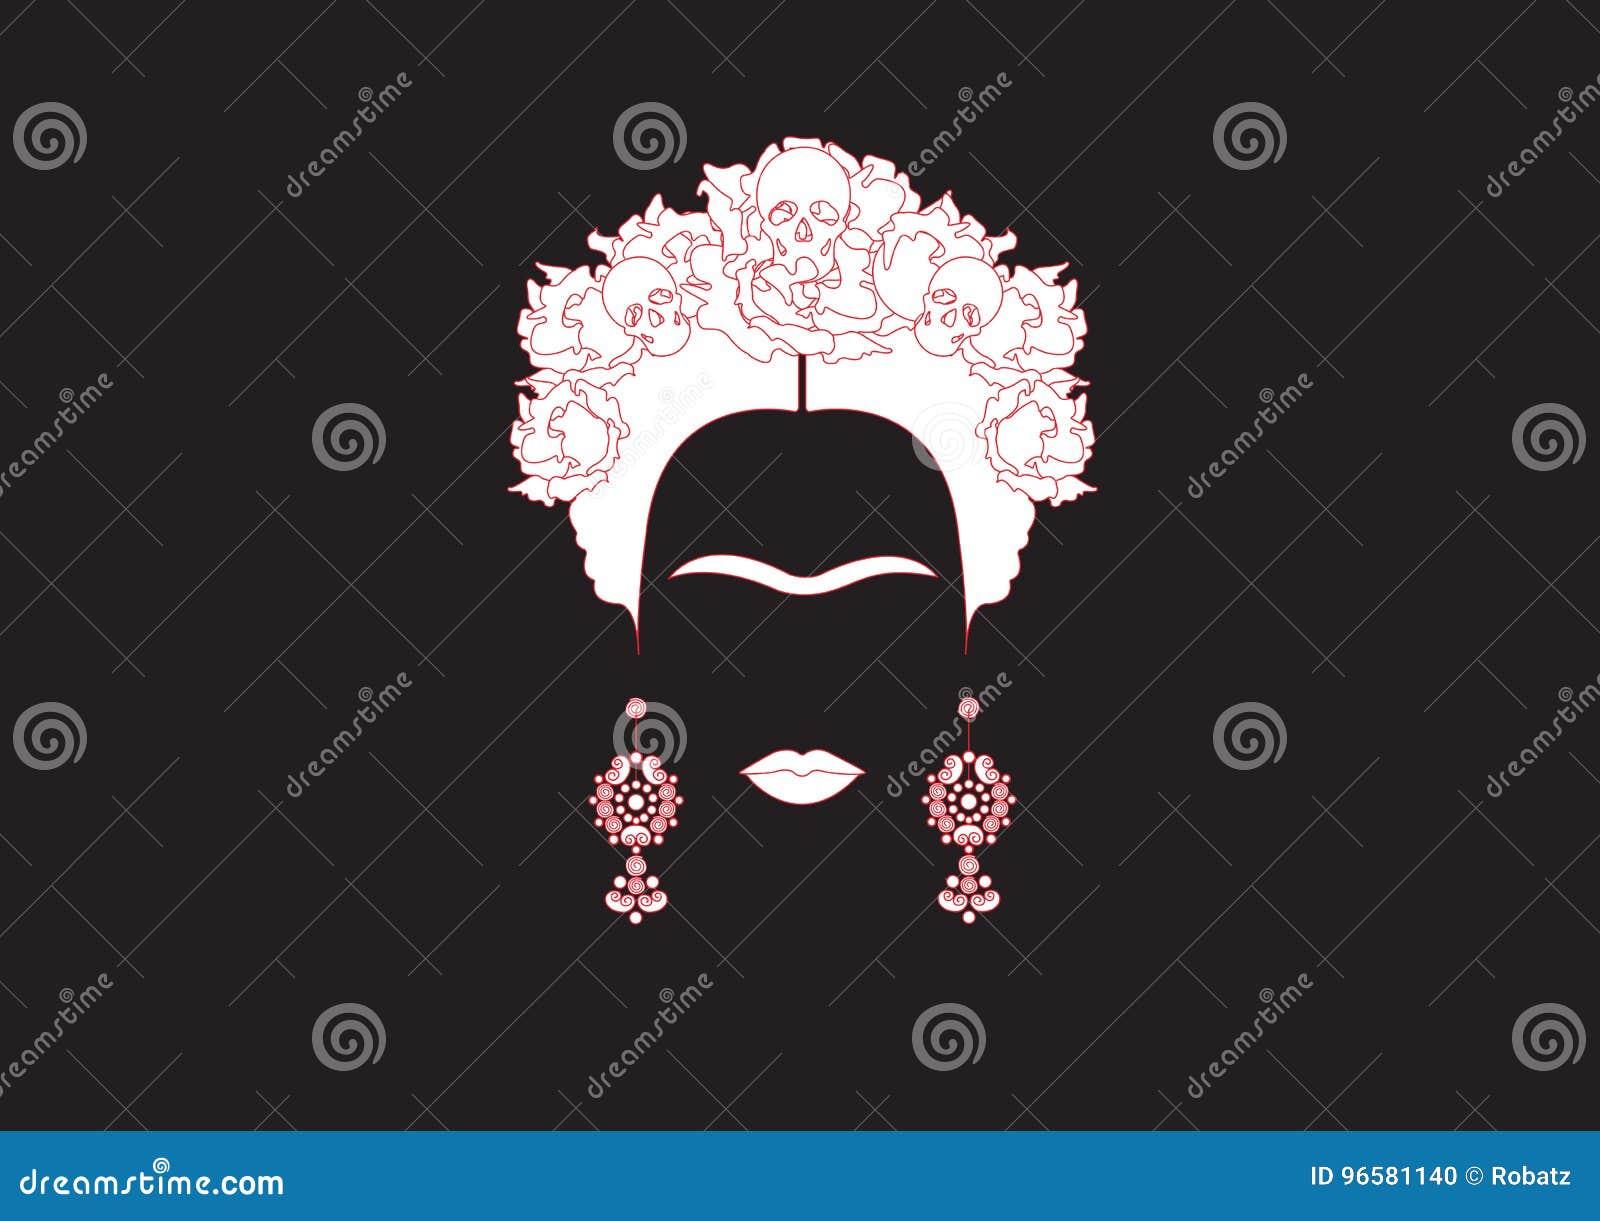 Frida Kahlo Minimalist Portrait With Earrings Roses And Skulls